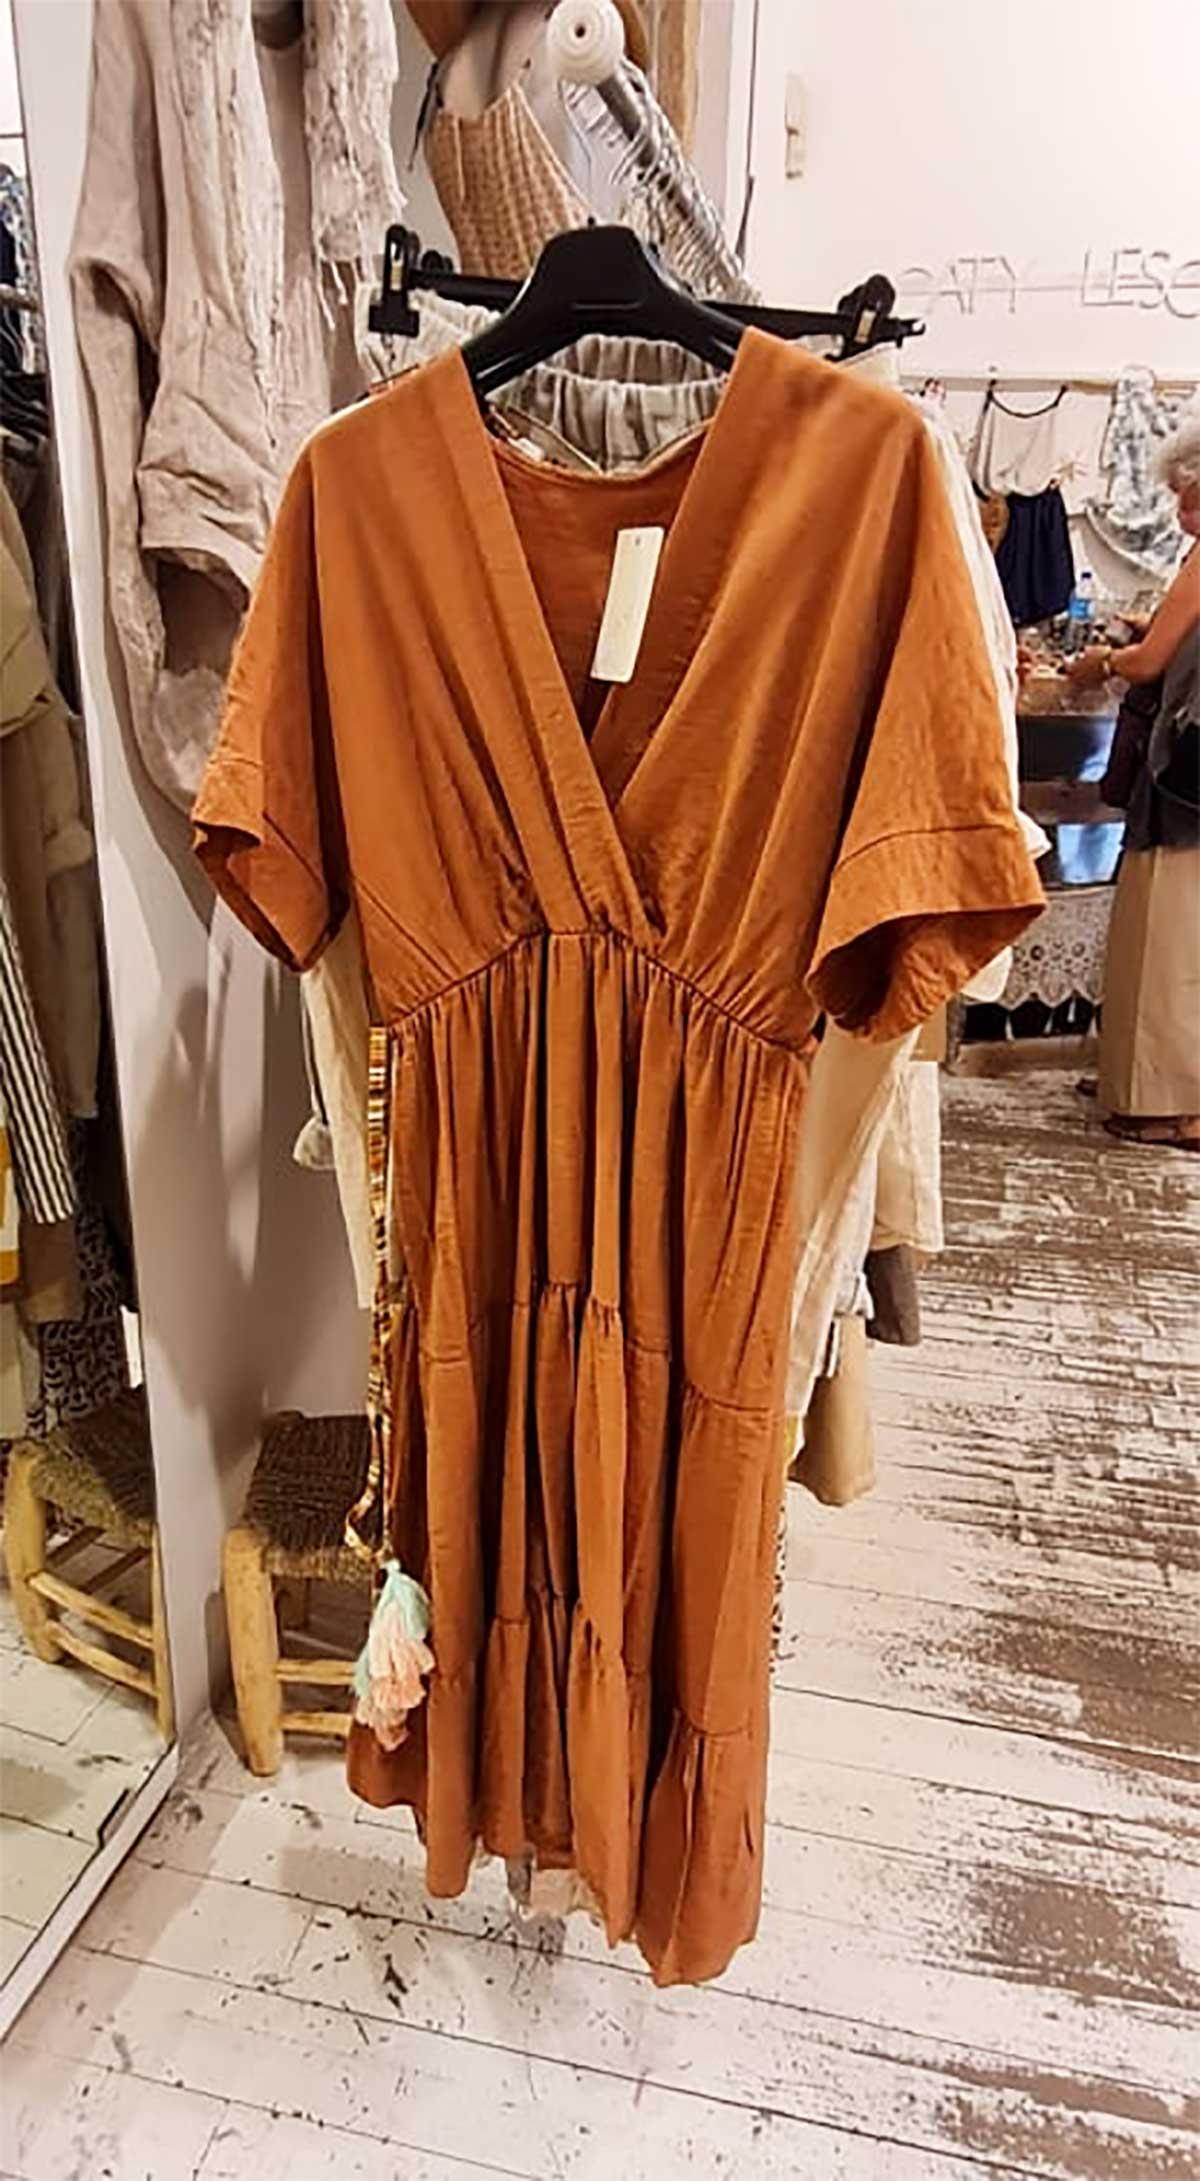 robe-terracotta-boutique-Caty-Lesca-Montpellier